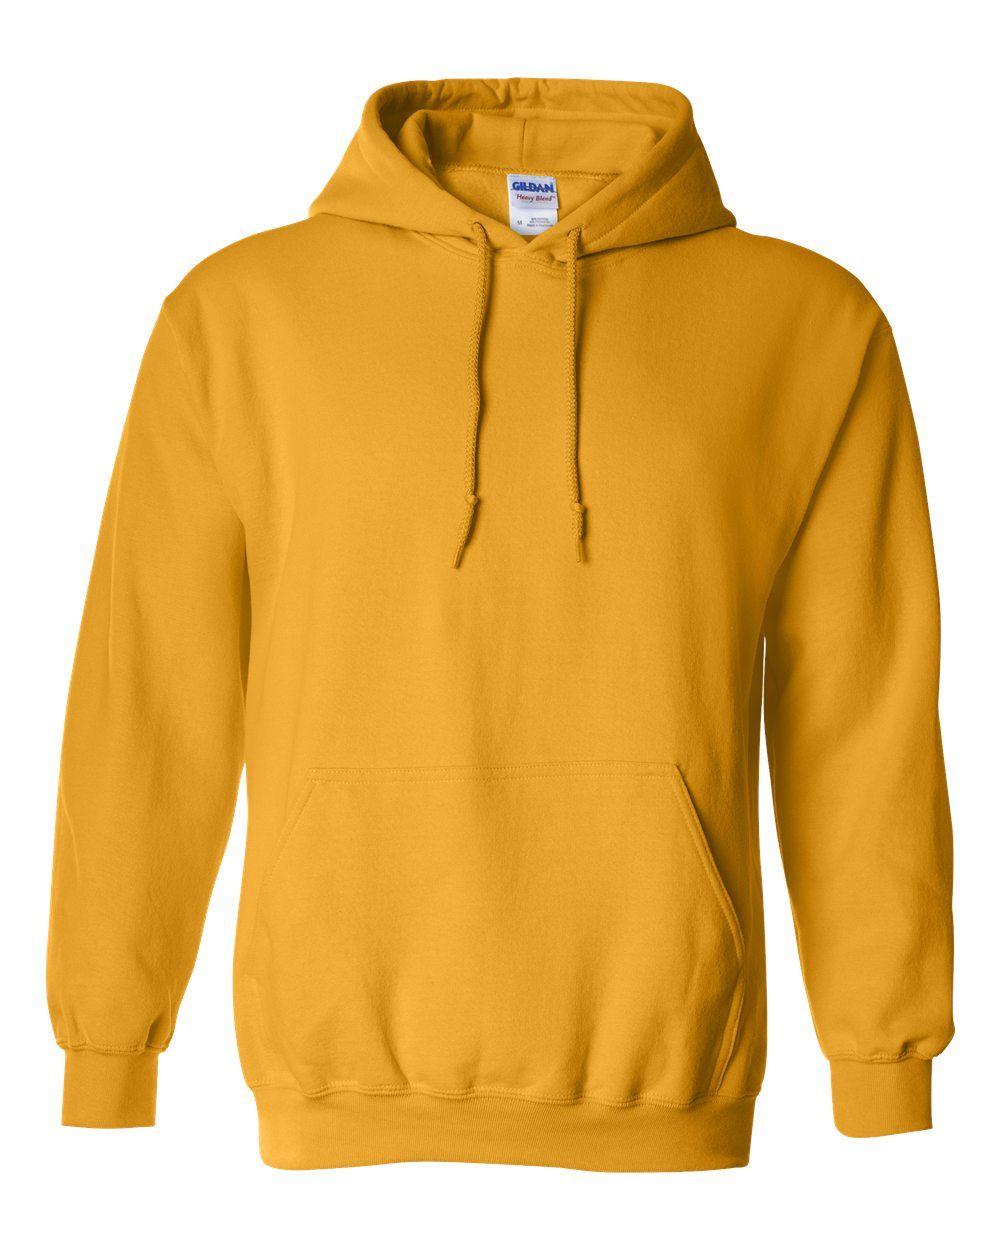 Gildan 18500 Heavy Blend Hooded Sweatshirt Hooded Sweatshirts Sweatshirts Hoodies Men [ 1250 x 1000 Pixel ]